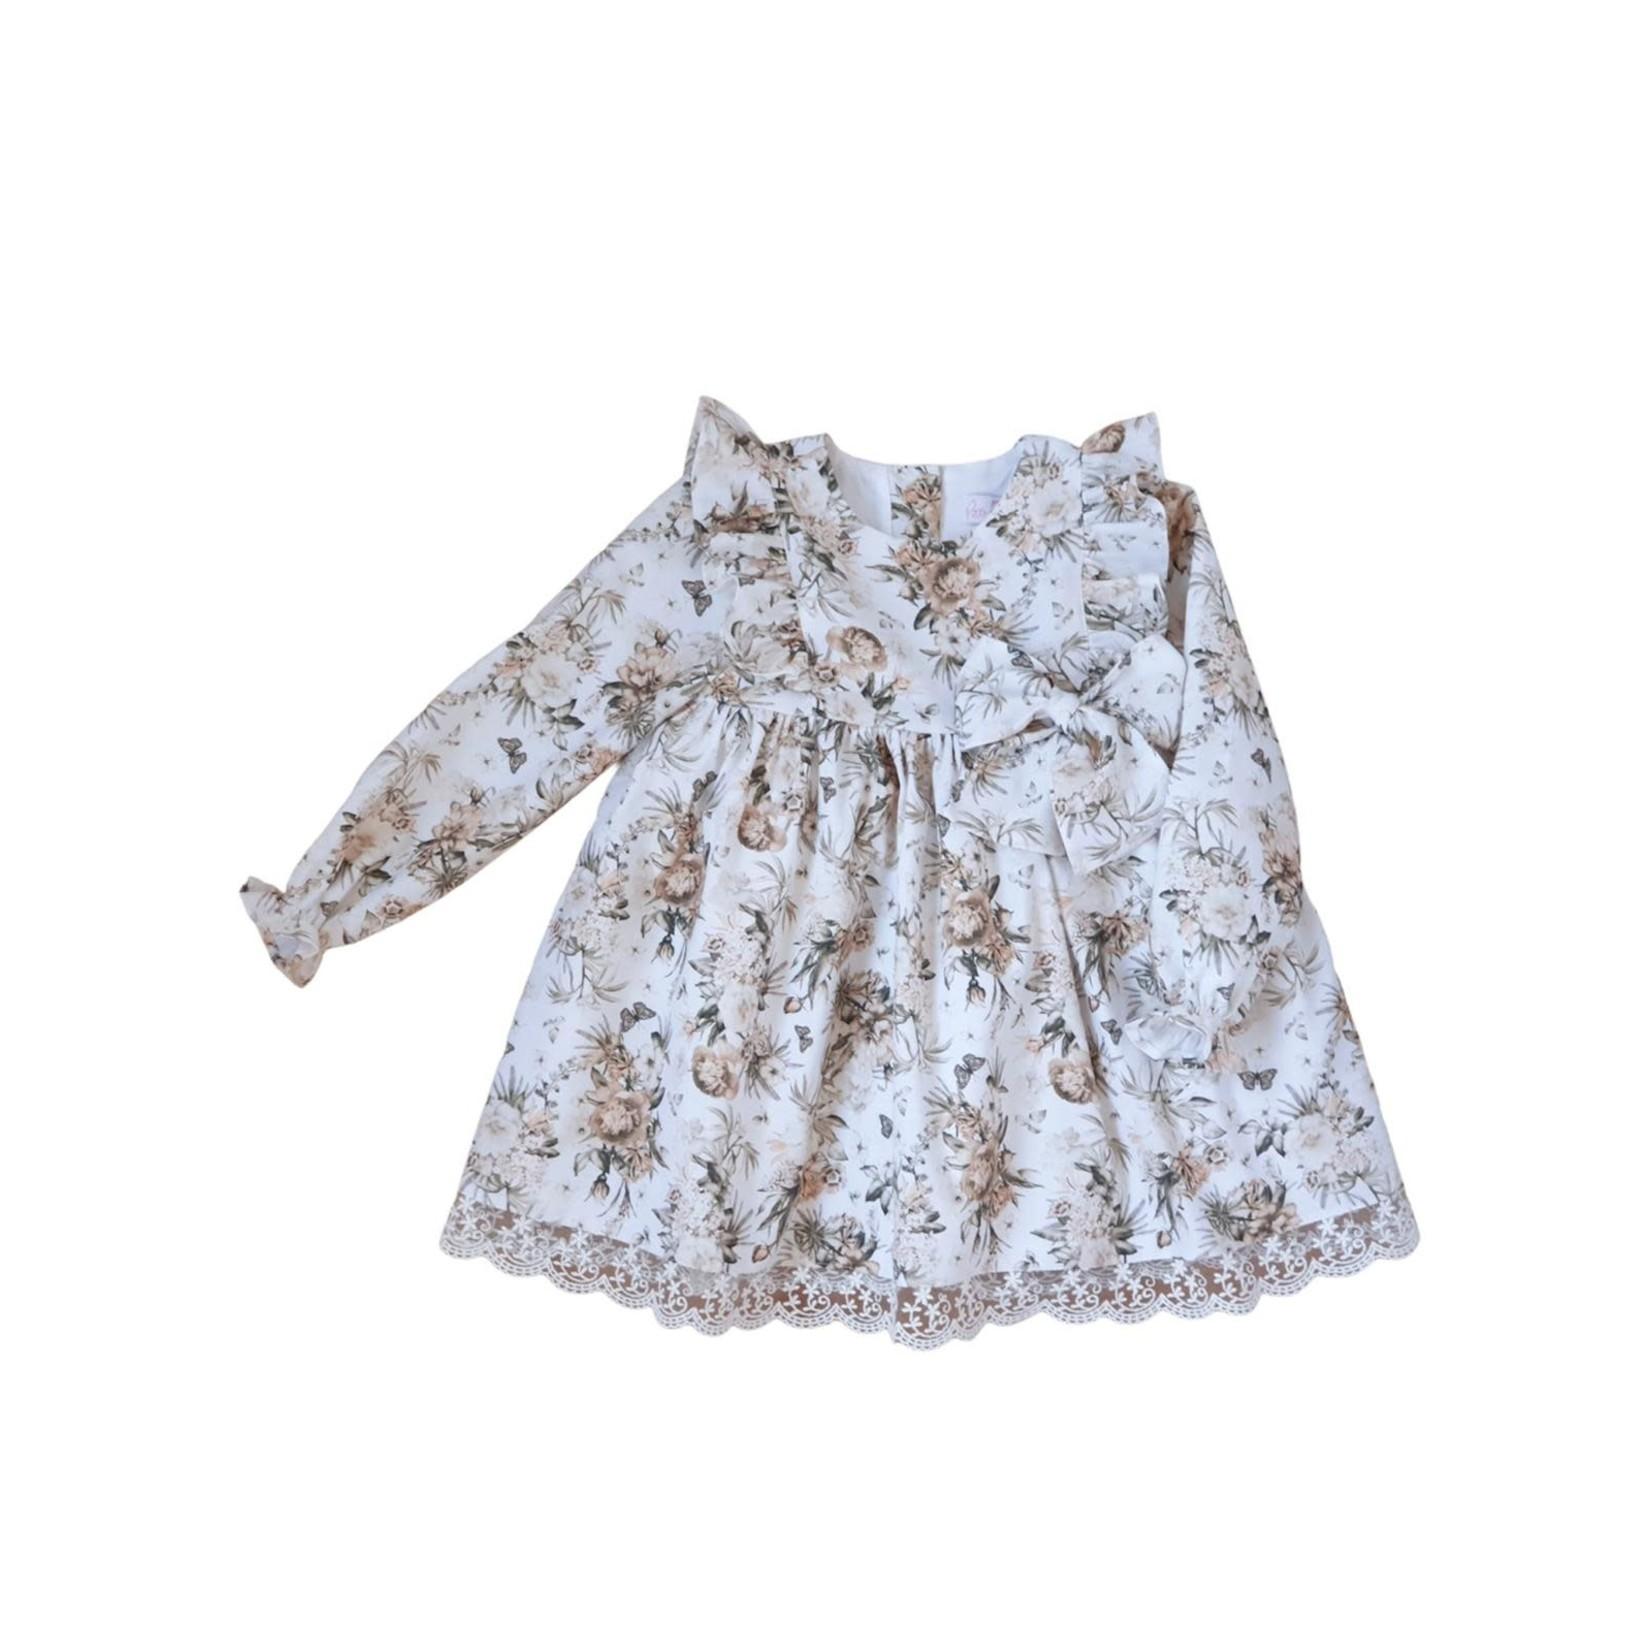 Petite Zara Dress Coco - Petite Zara